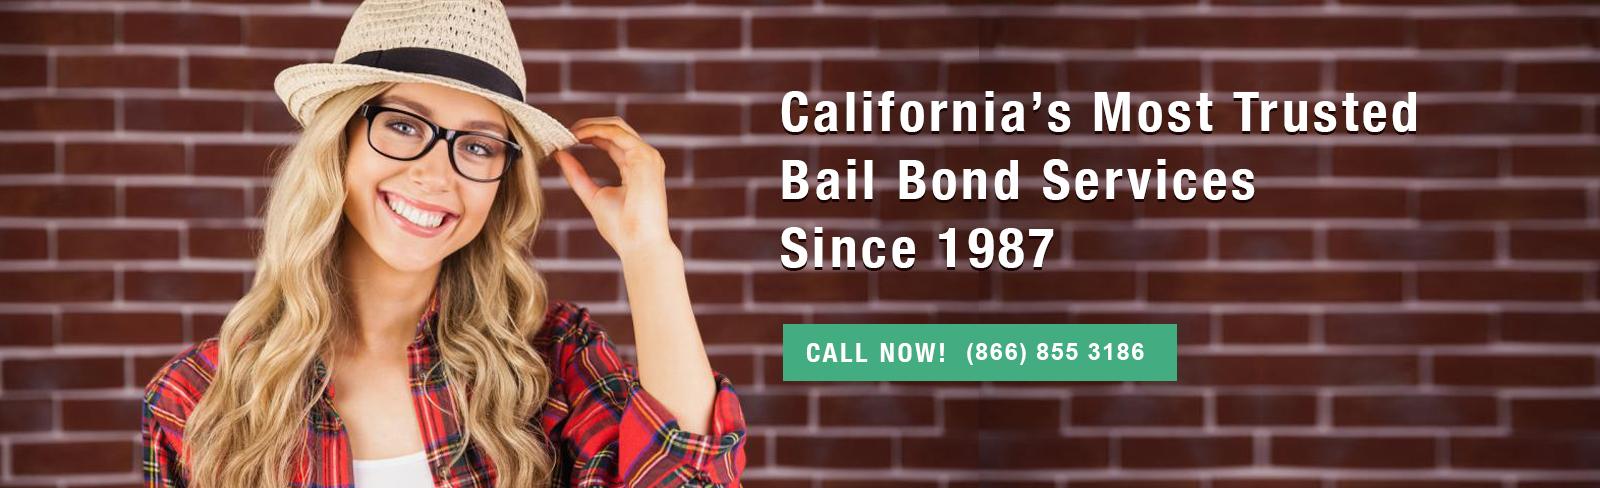 carls-bail-bonds-banner-1